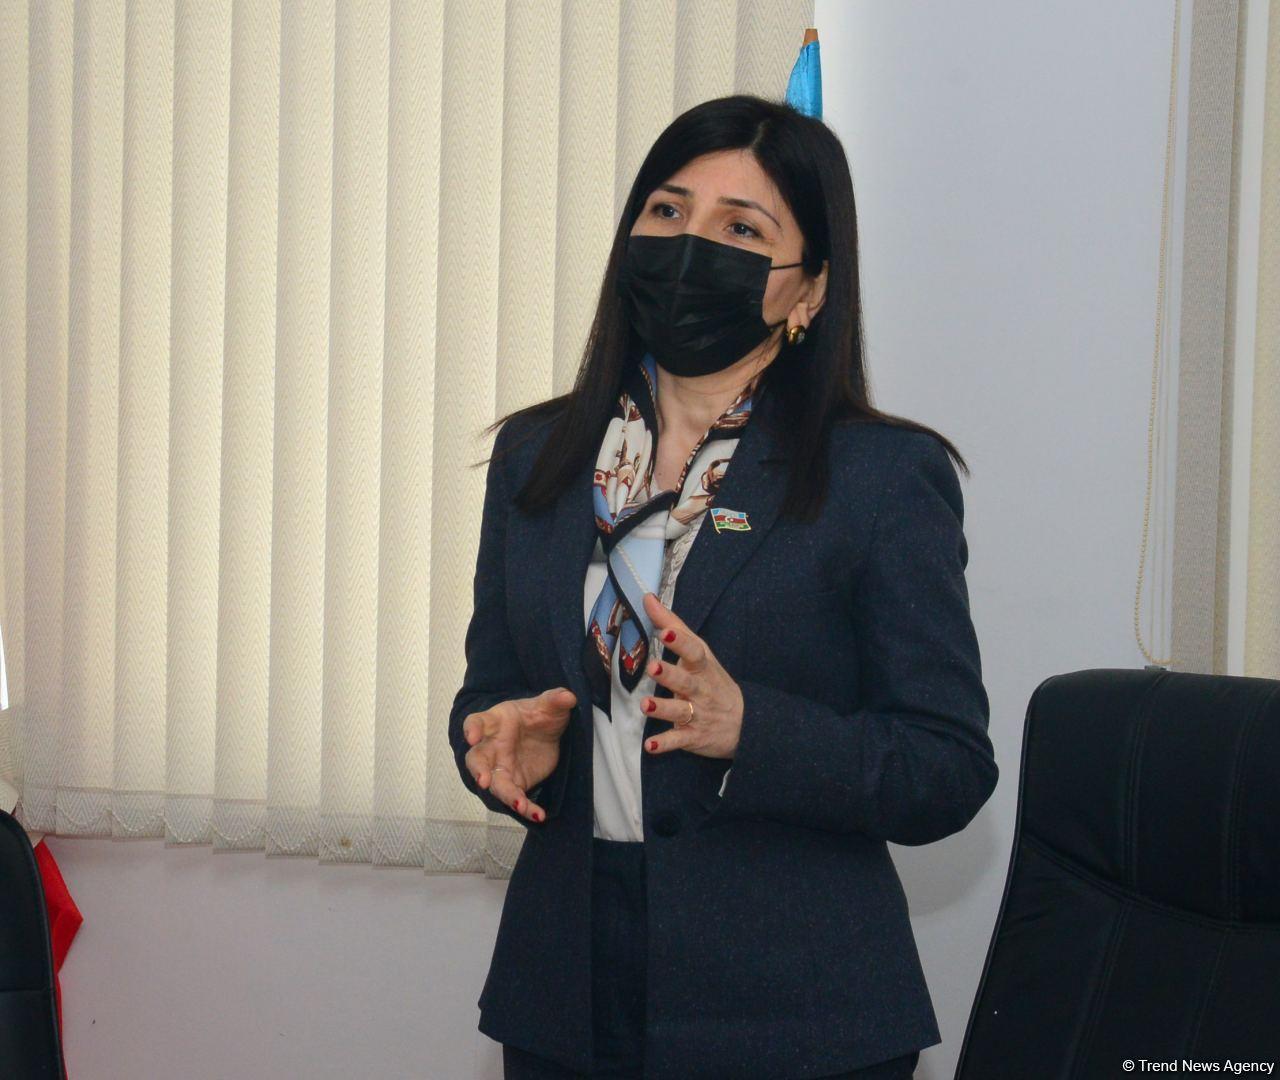 Депутат Севиль Микаилова встретилась с избирателями в Худате